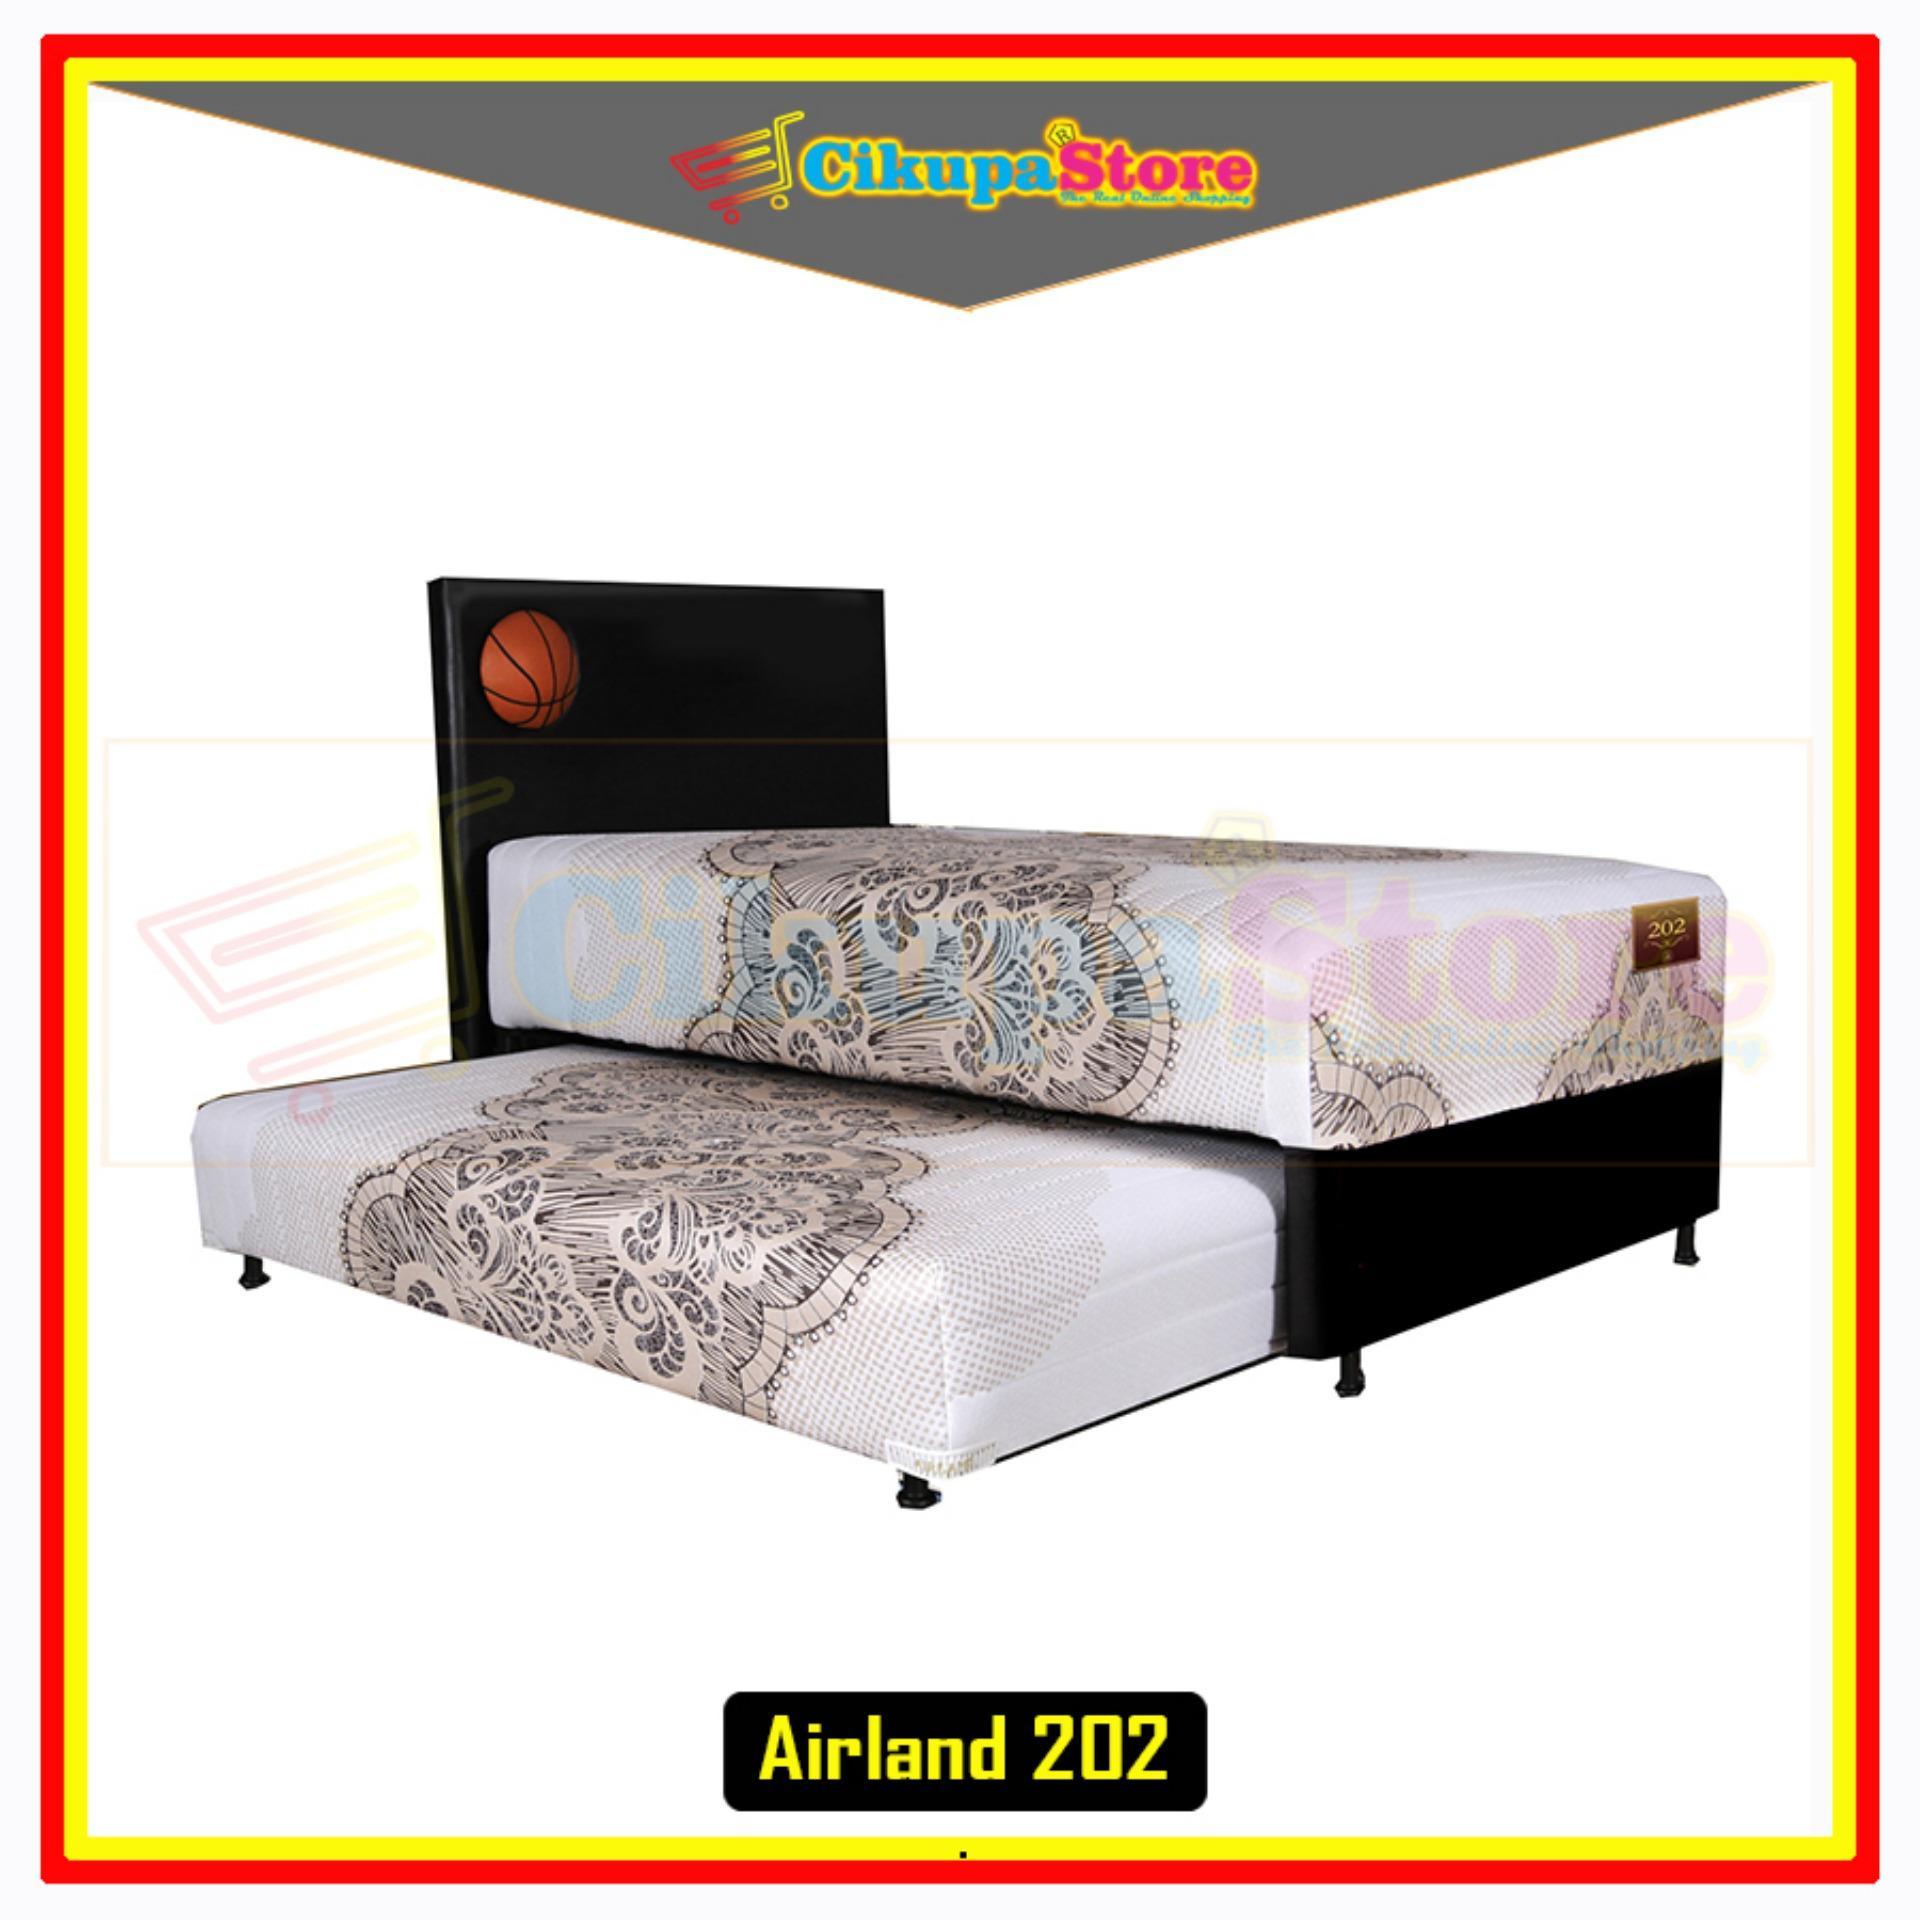 FREE ONGKIR !! Kasur Spring Bed Matras 2in1 Airland 202 Deluxe - 90x200 Full Set